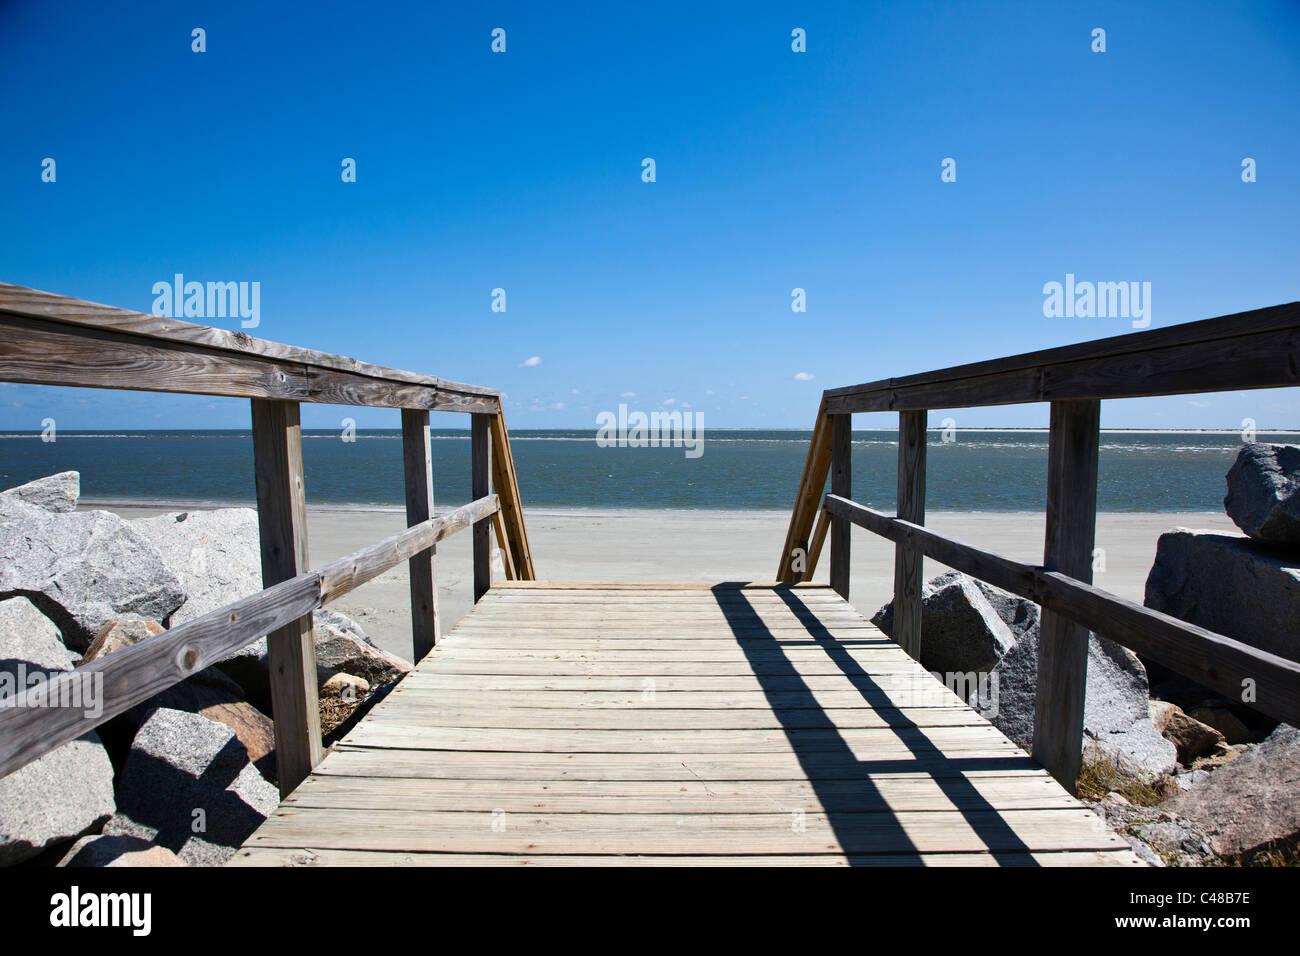 Wooden boardwalk to the beach on Seabrook Island, near Charleston, South Carolina, USA - Stock Image